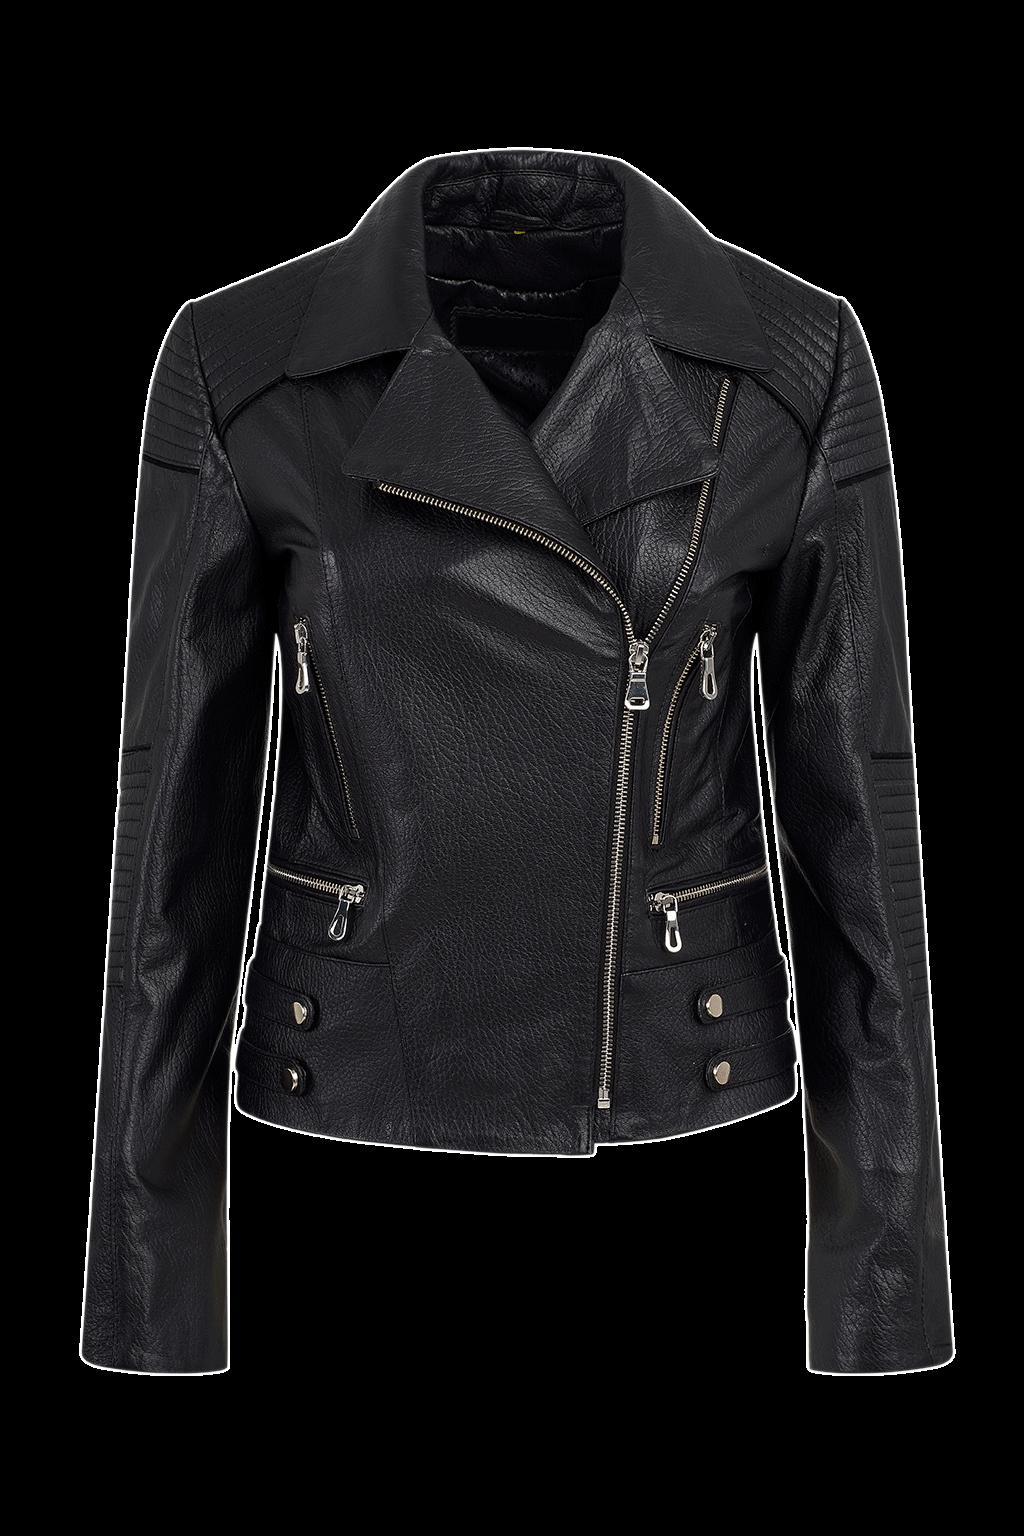 Women's Leather Motorcycle Jacket - Black